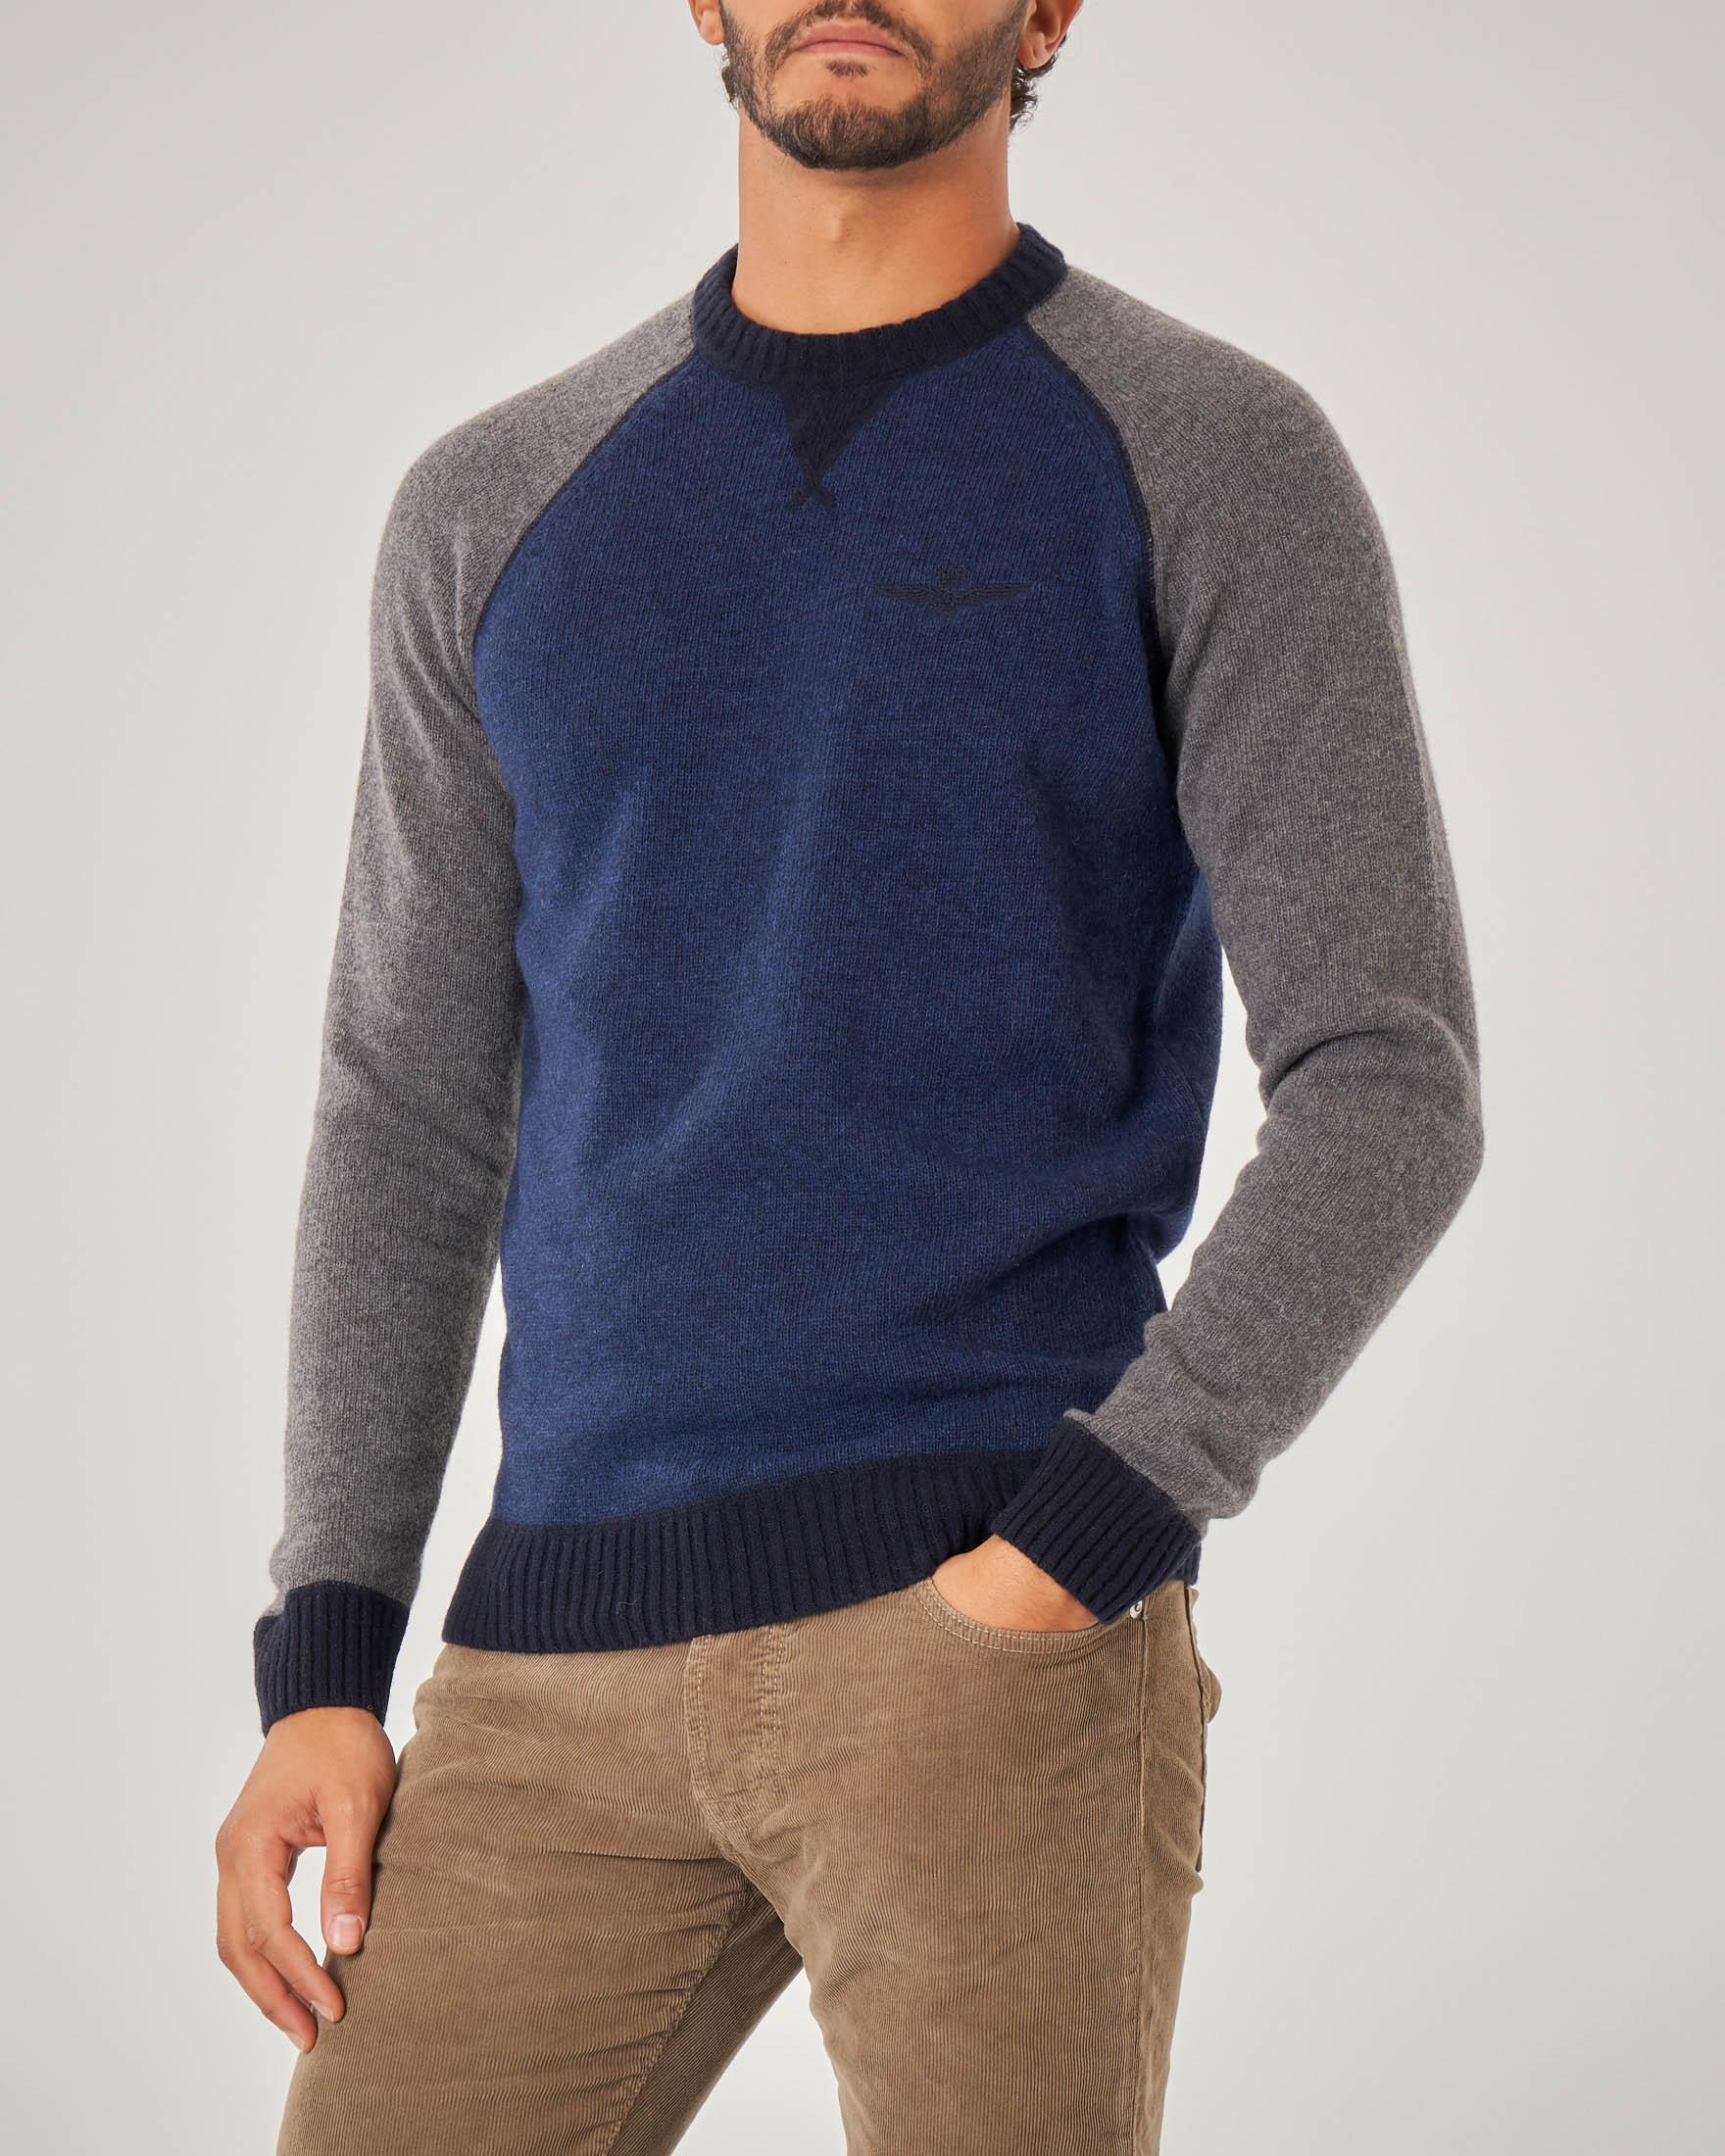 Maglia blu in lana con maniche raglan grigie